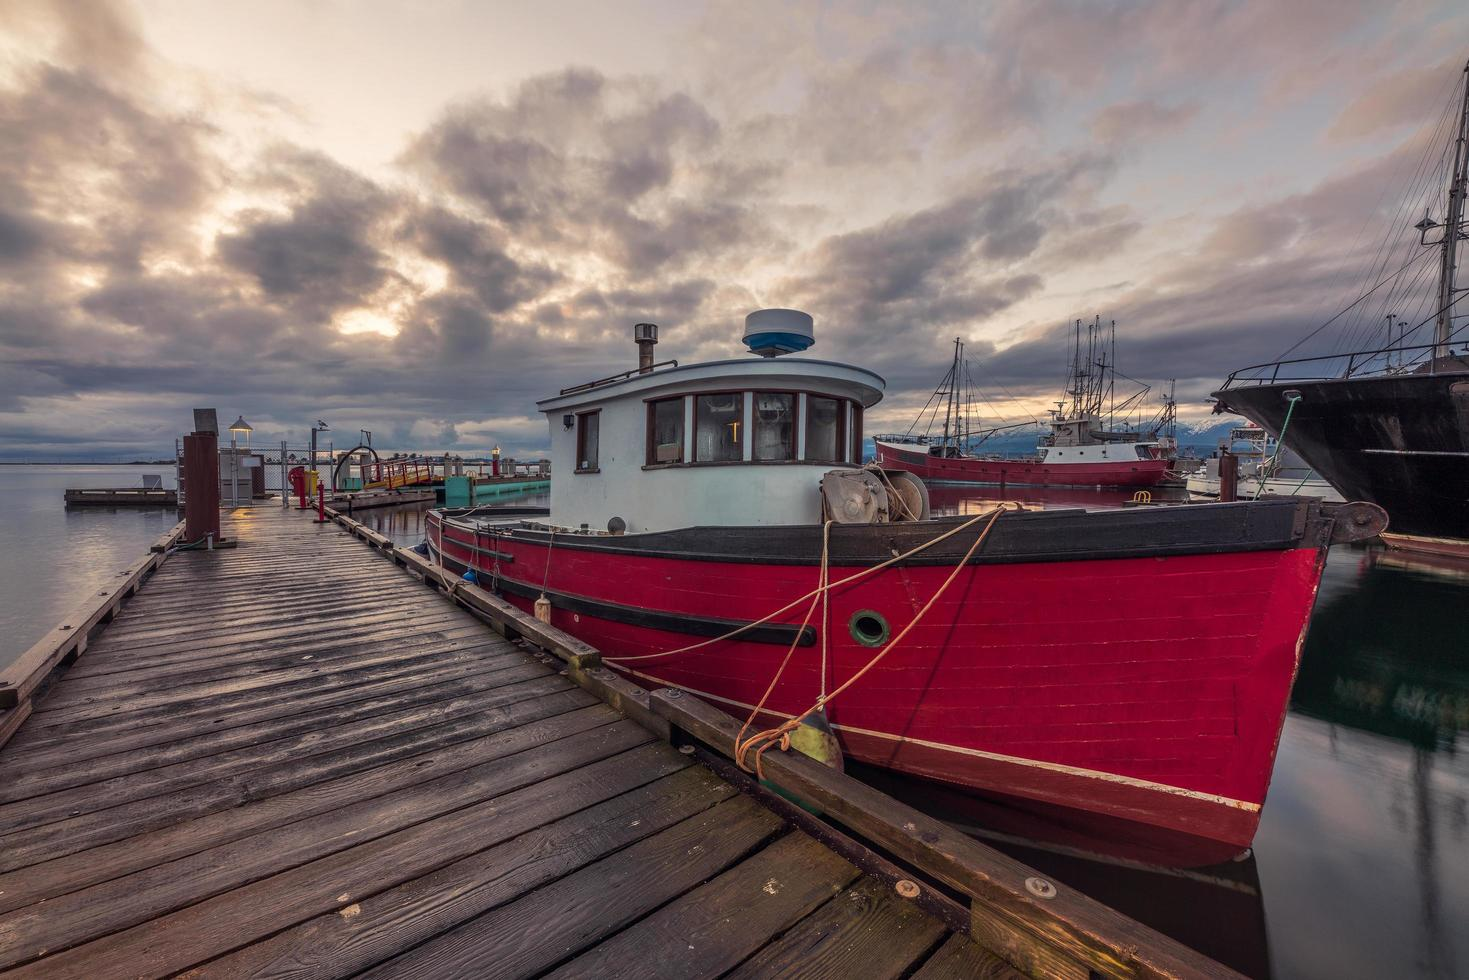 rode en witte boot op dok onder bewolkte hemel foto